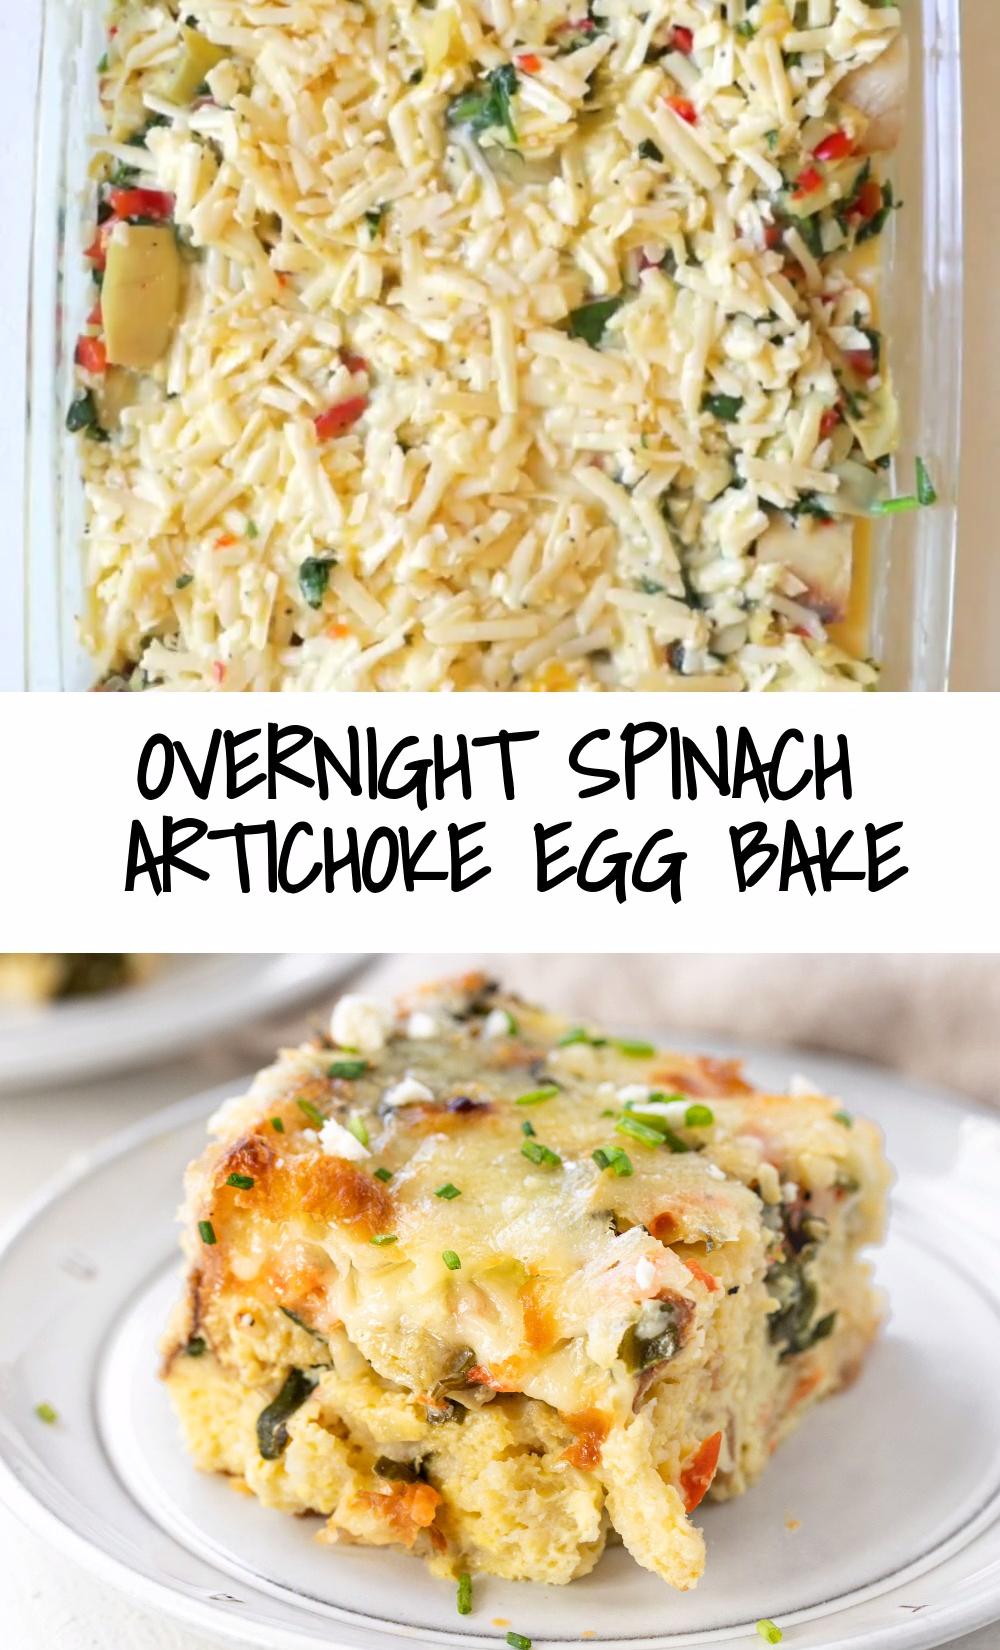 Overnight Spinach Artichoke Egg Bake (VIDEO)